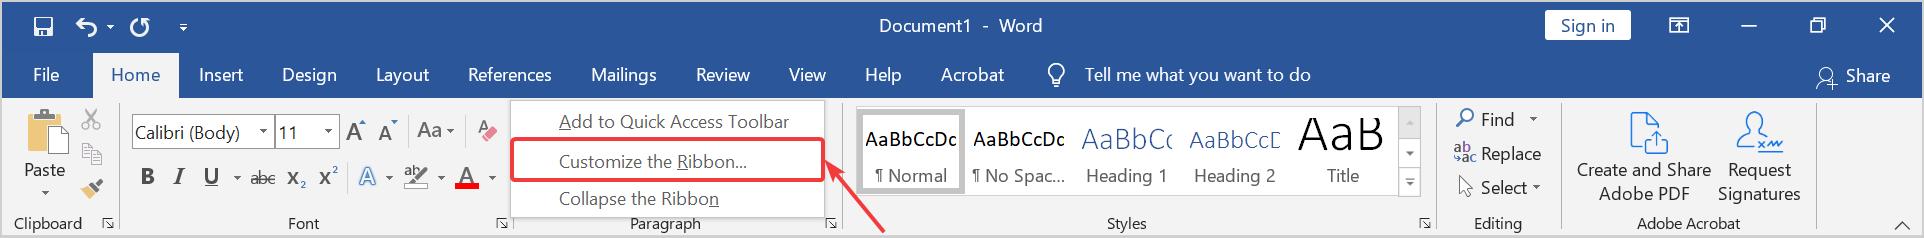 keyboard shortcut for superscript in word